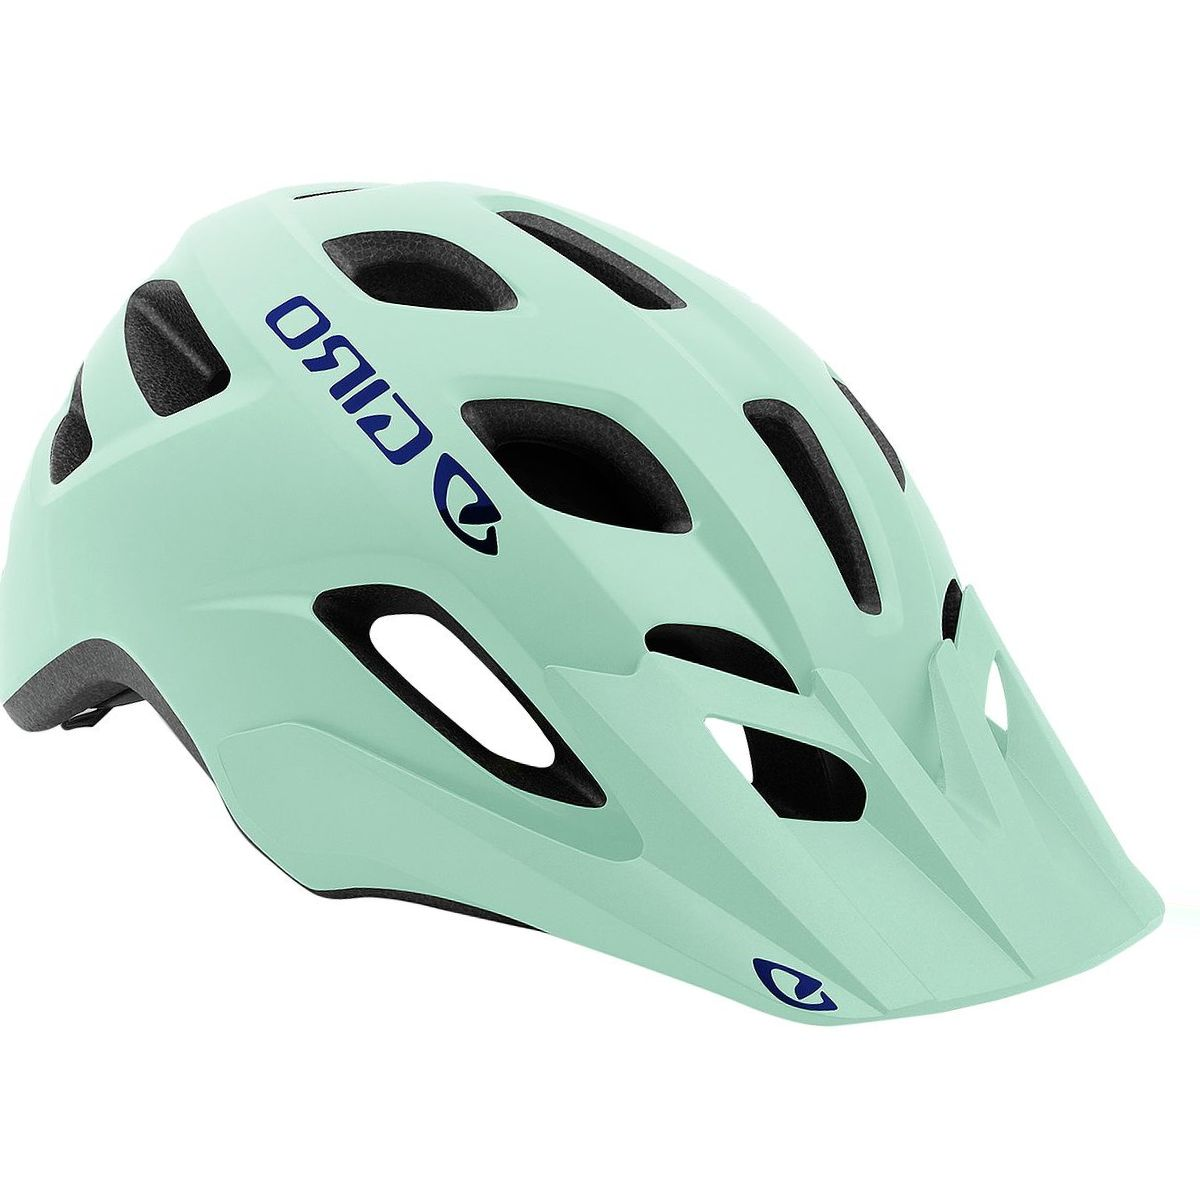 Giro Verce MIPS Helmet - Women's